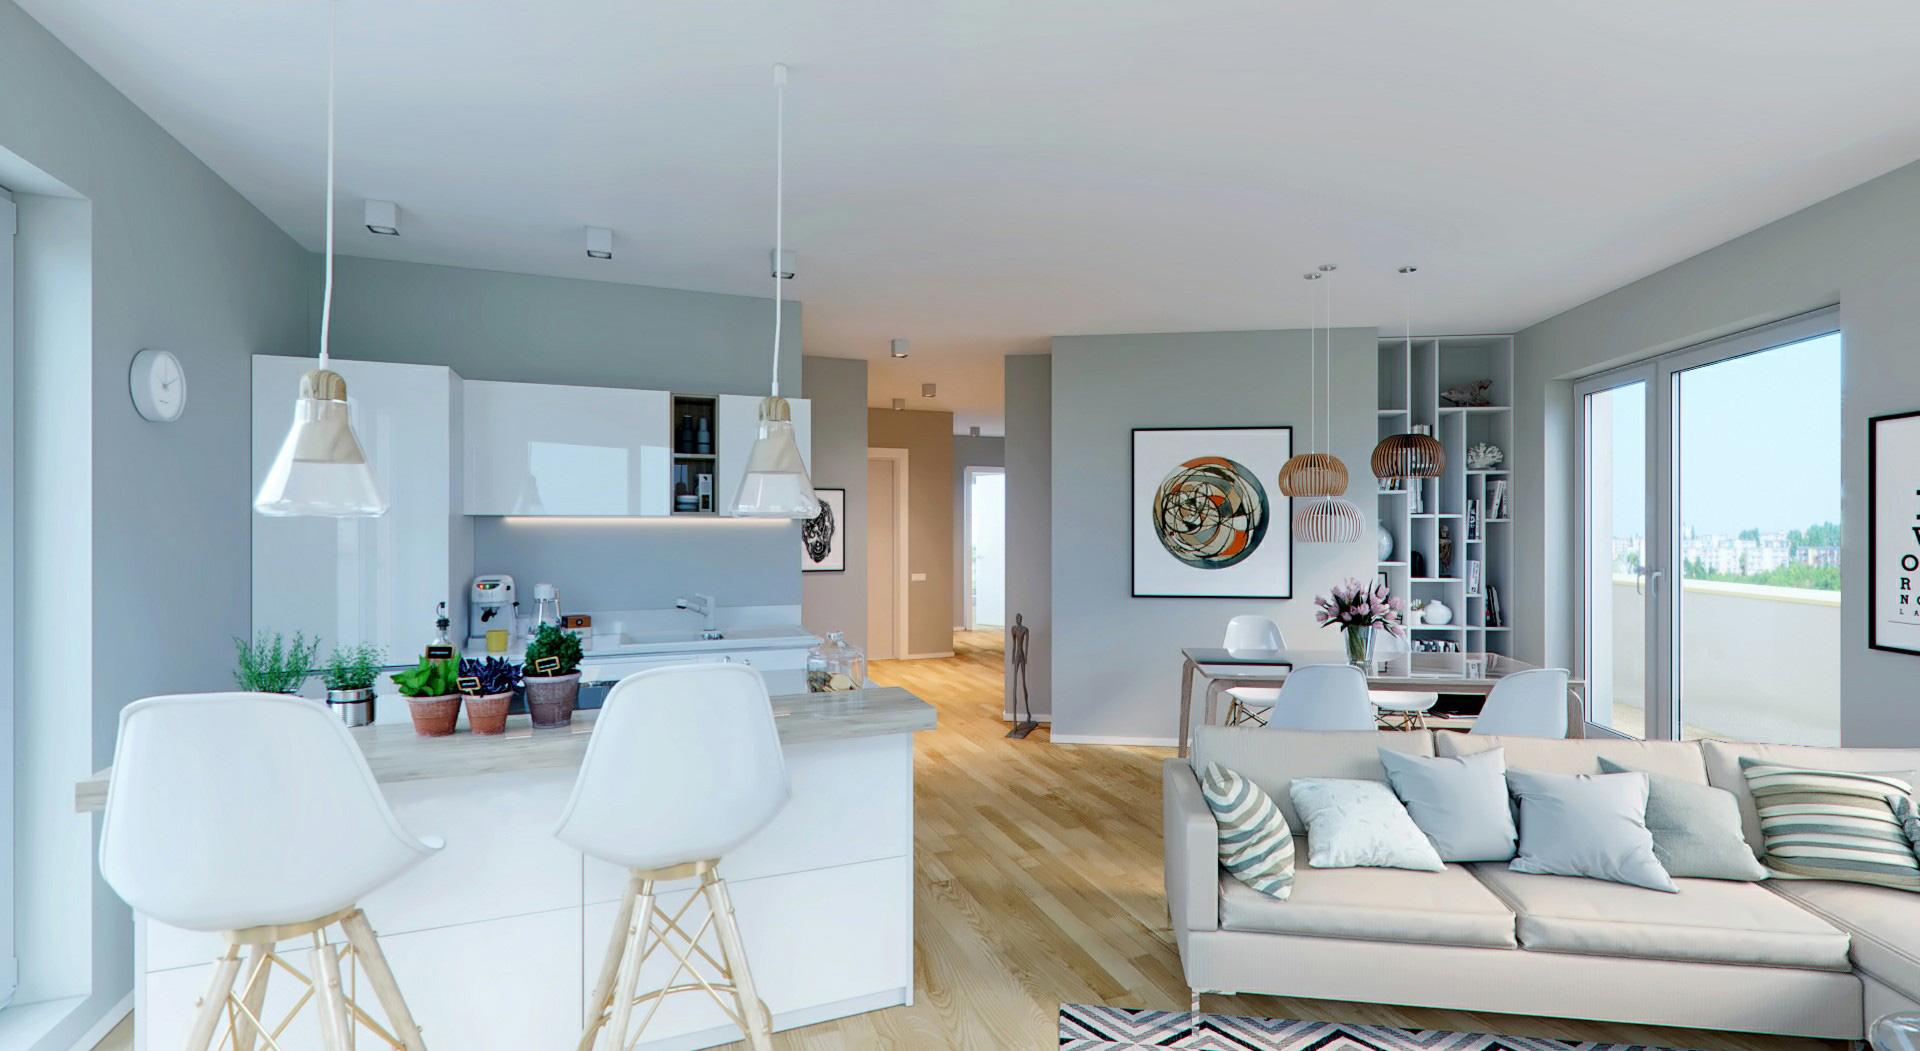 lehmann immobilien berlin eigentumswohnungen in pankow. Black Bedroom Furniture Sets. Home Design Ideas